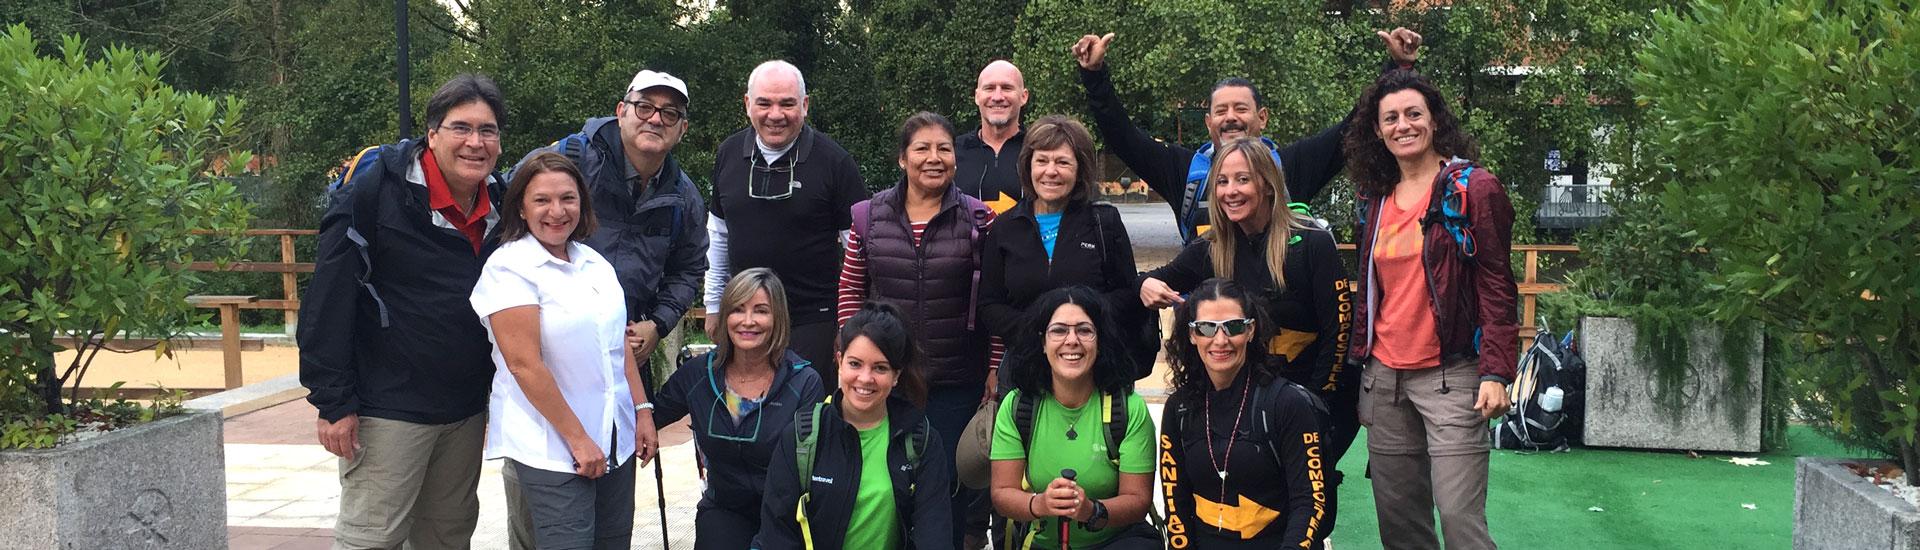 Camino de Santiago Organizado en grupo